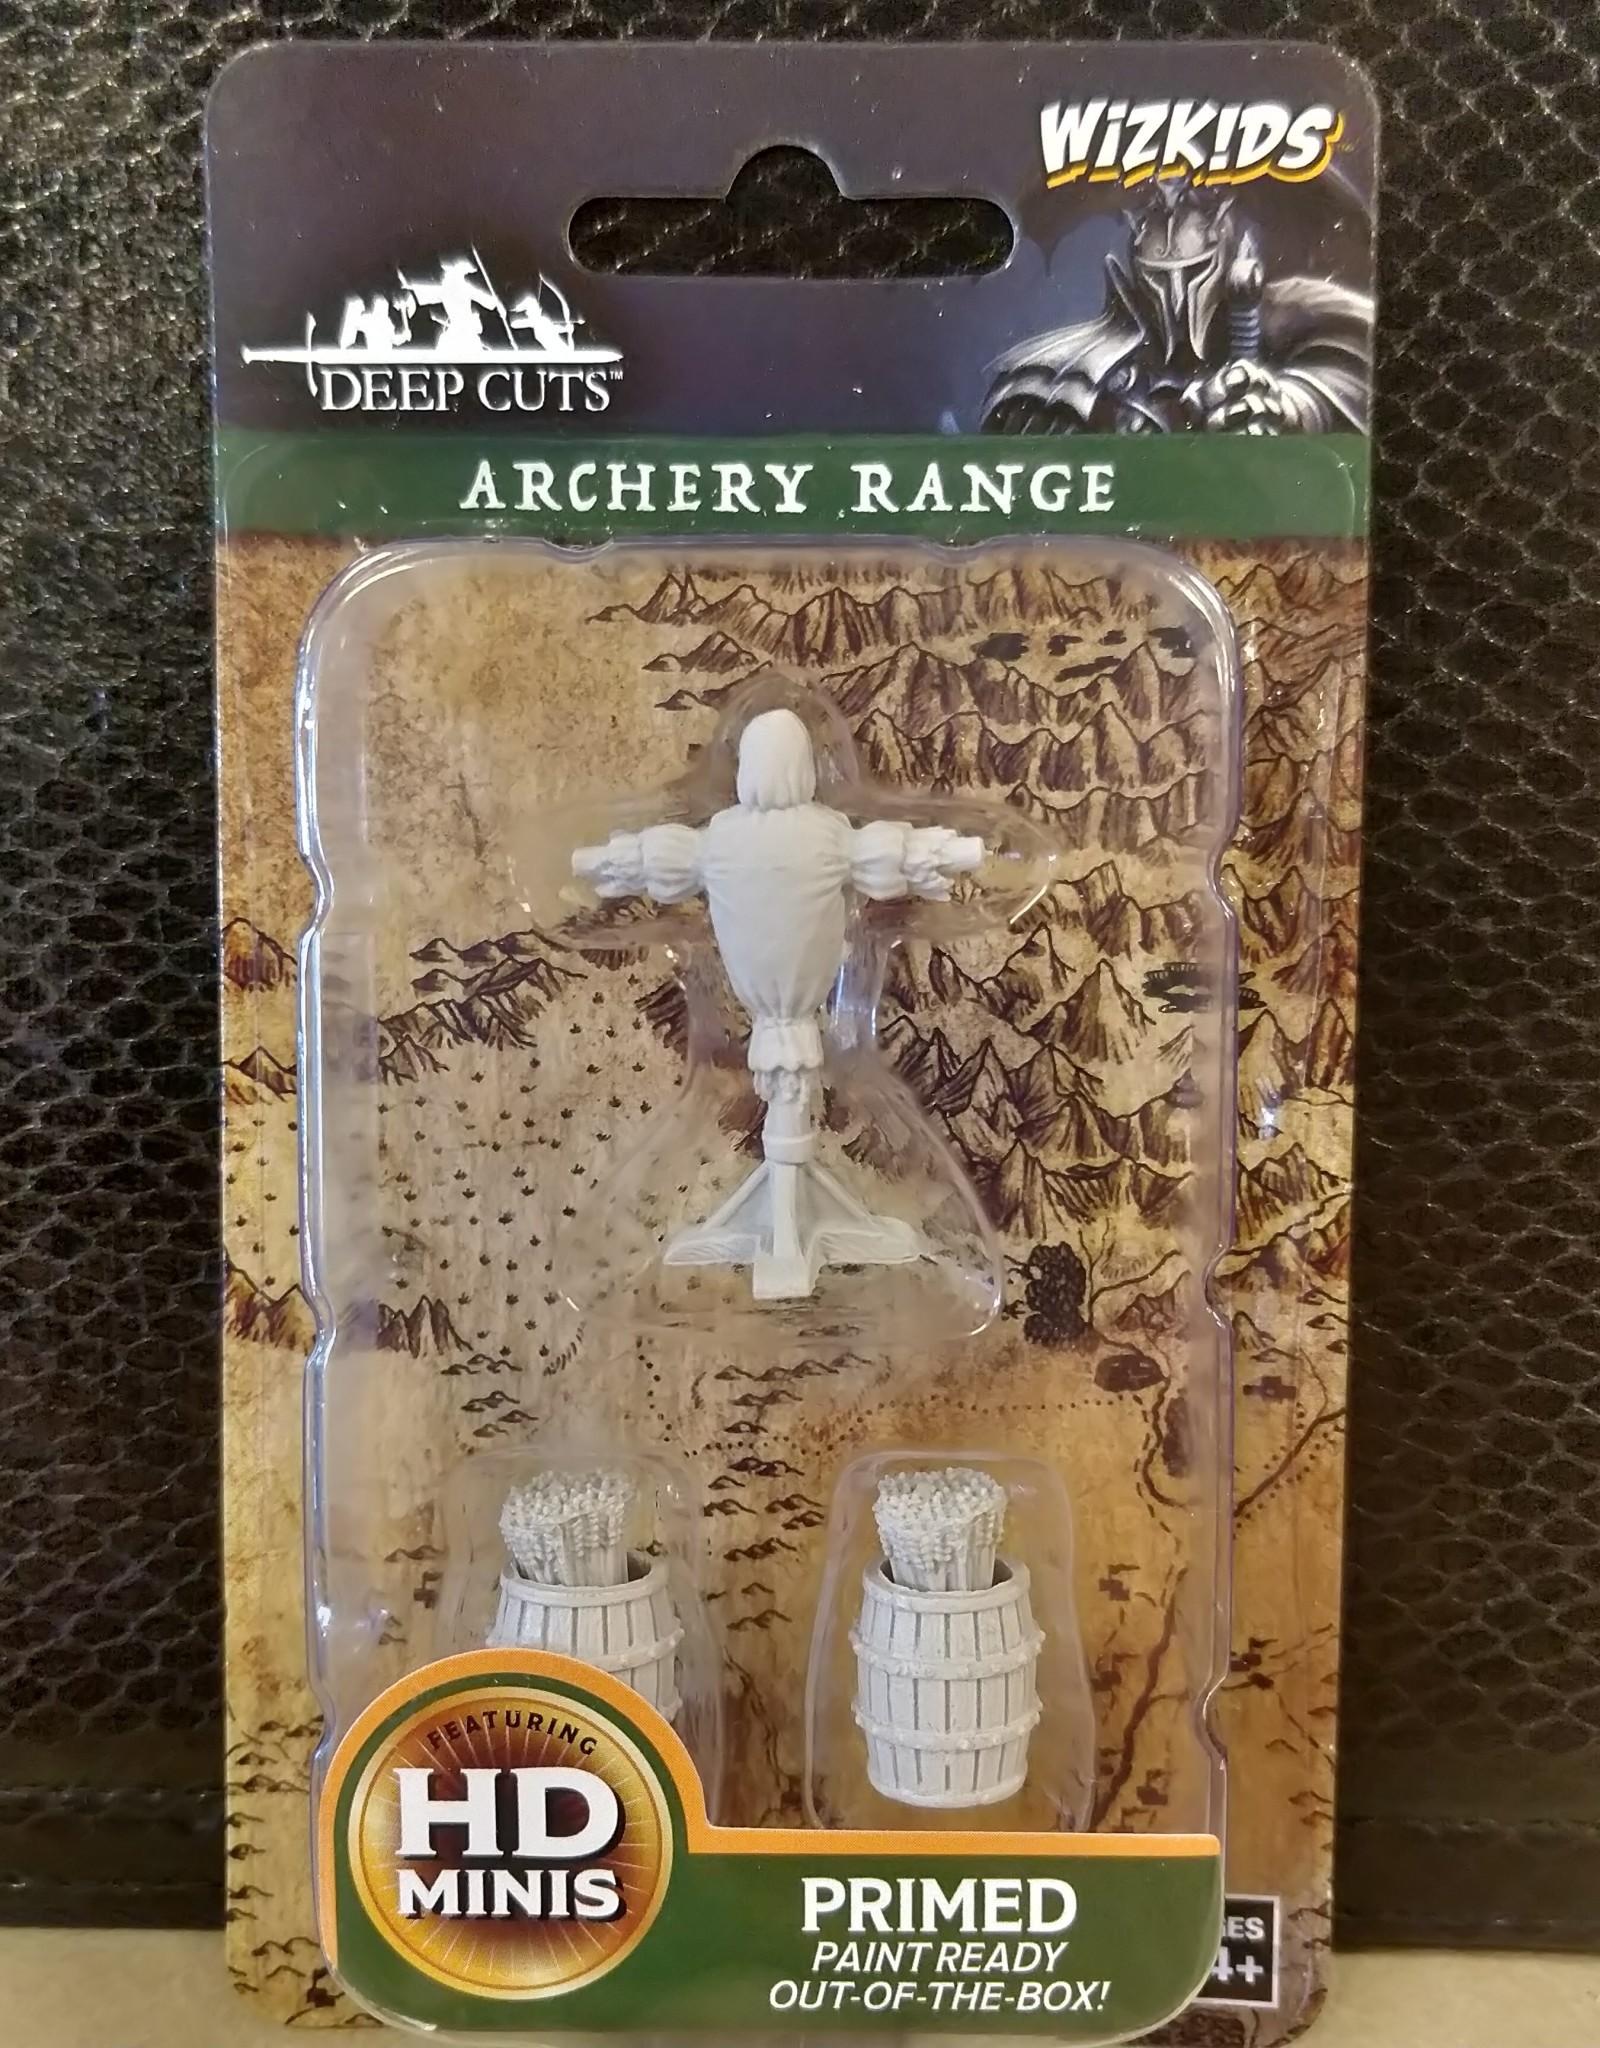 Wizkids WizKids Deep Cuts Unpainted Miniatures: W10 Archery Range